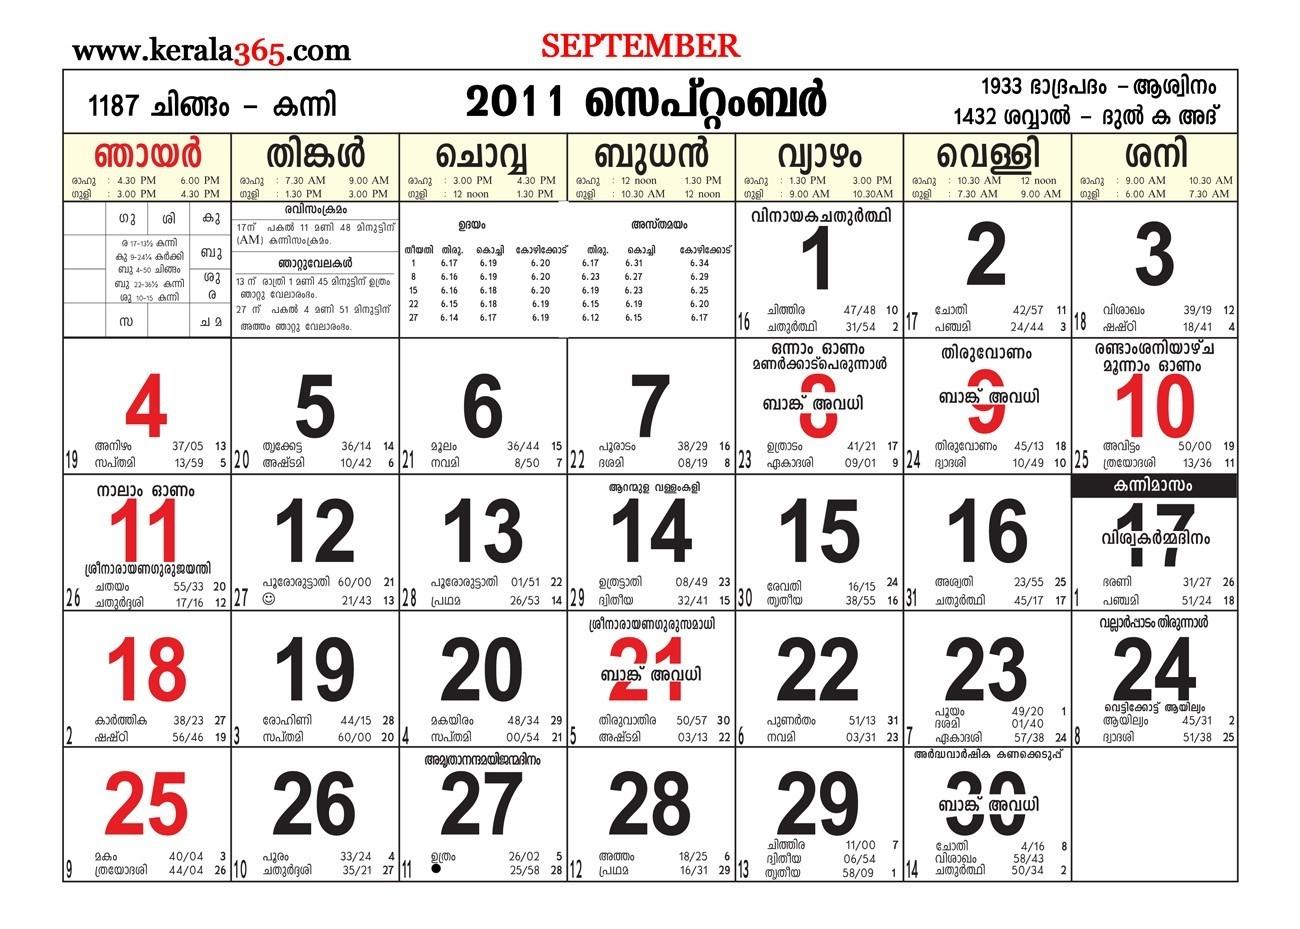 Malayalam Calender September 2011 Kerala365 Malayalam Calendar  September 2014 Malayala Manorama Calendar